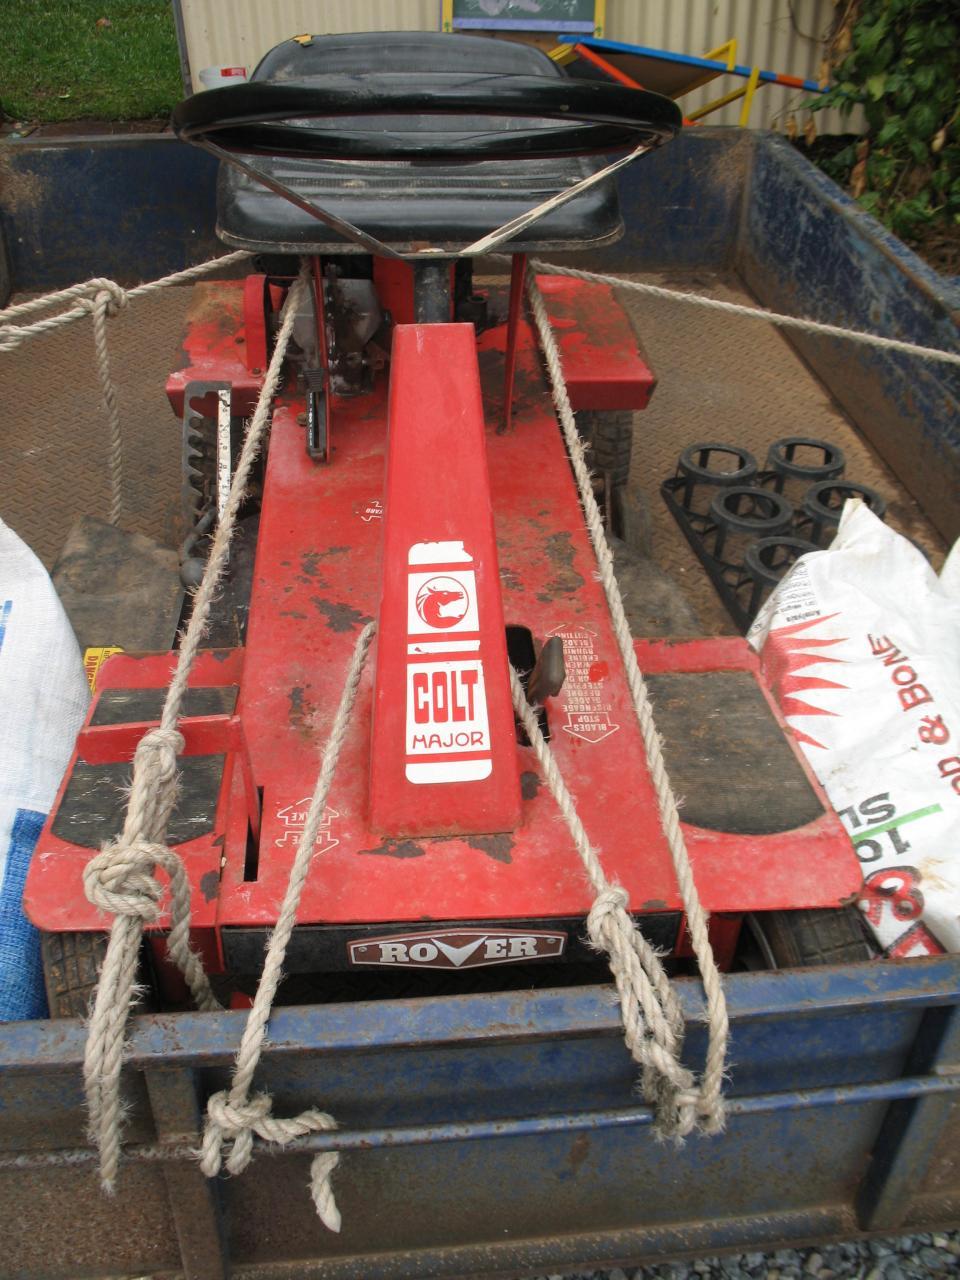 Barn Find Rover Colt Major Outdoorking Repair Forum